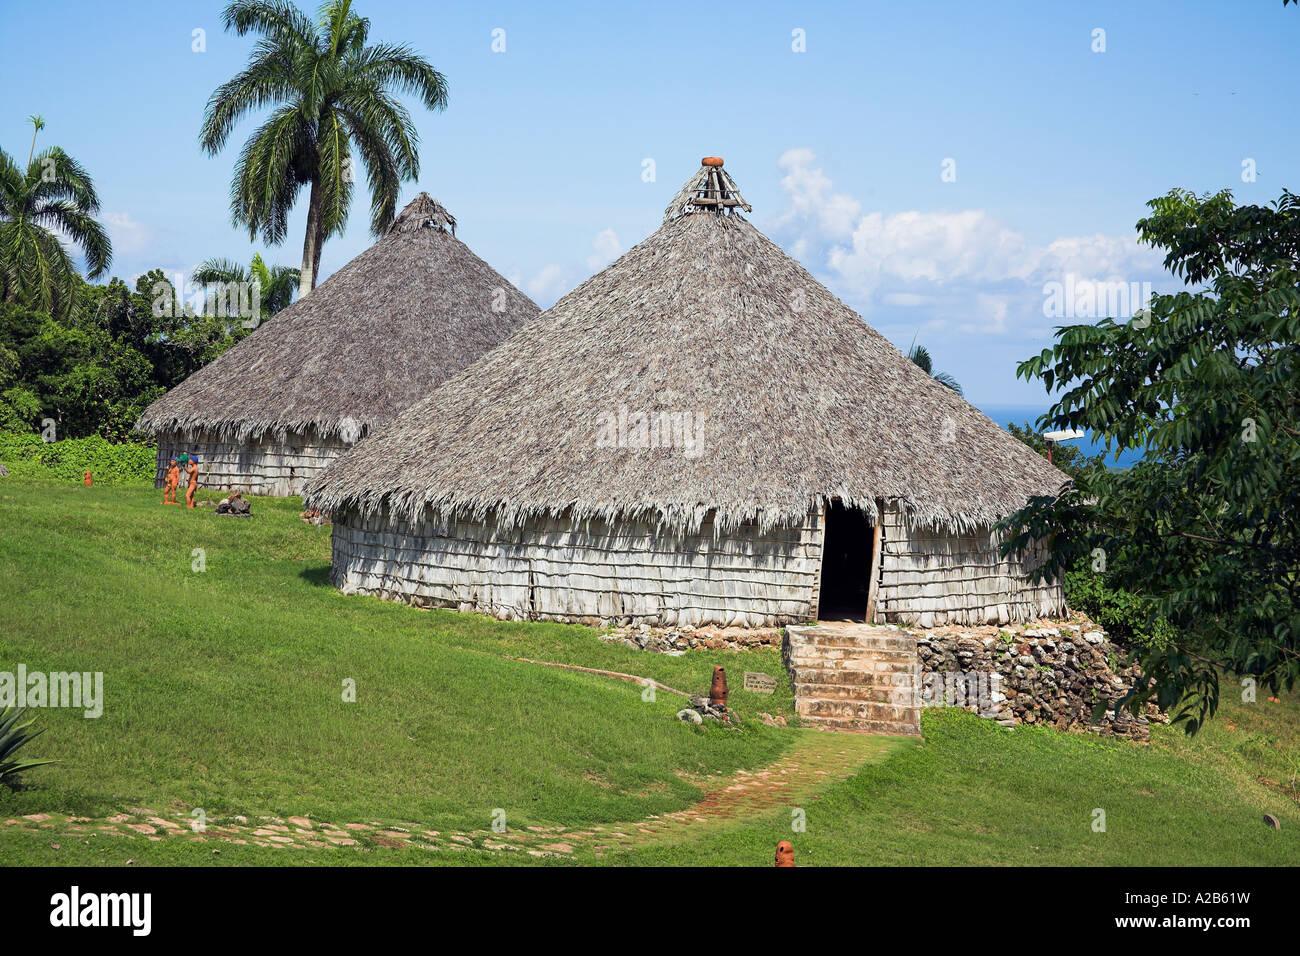 Houses in reproduction Taino Indian village, Chorro de Maita, Banes, near Guardalavaca, Holguin Province, Cuba - Stock Image